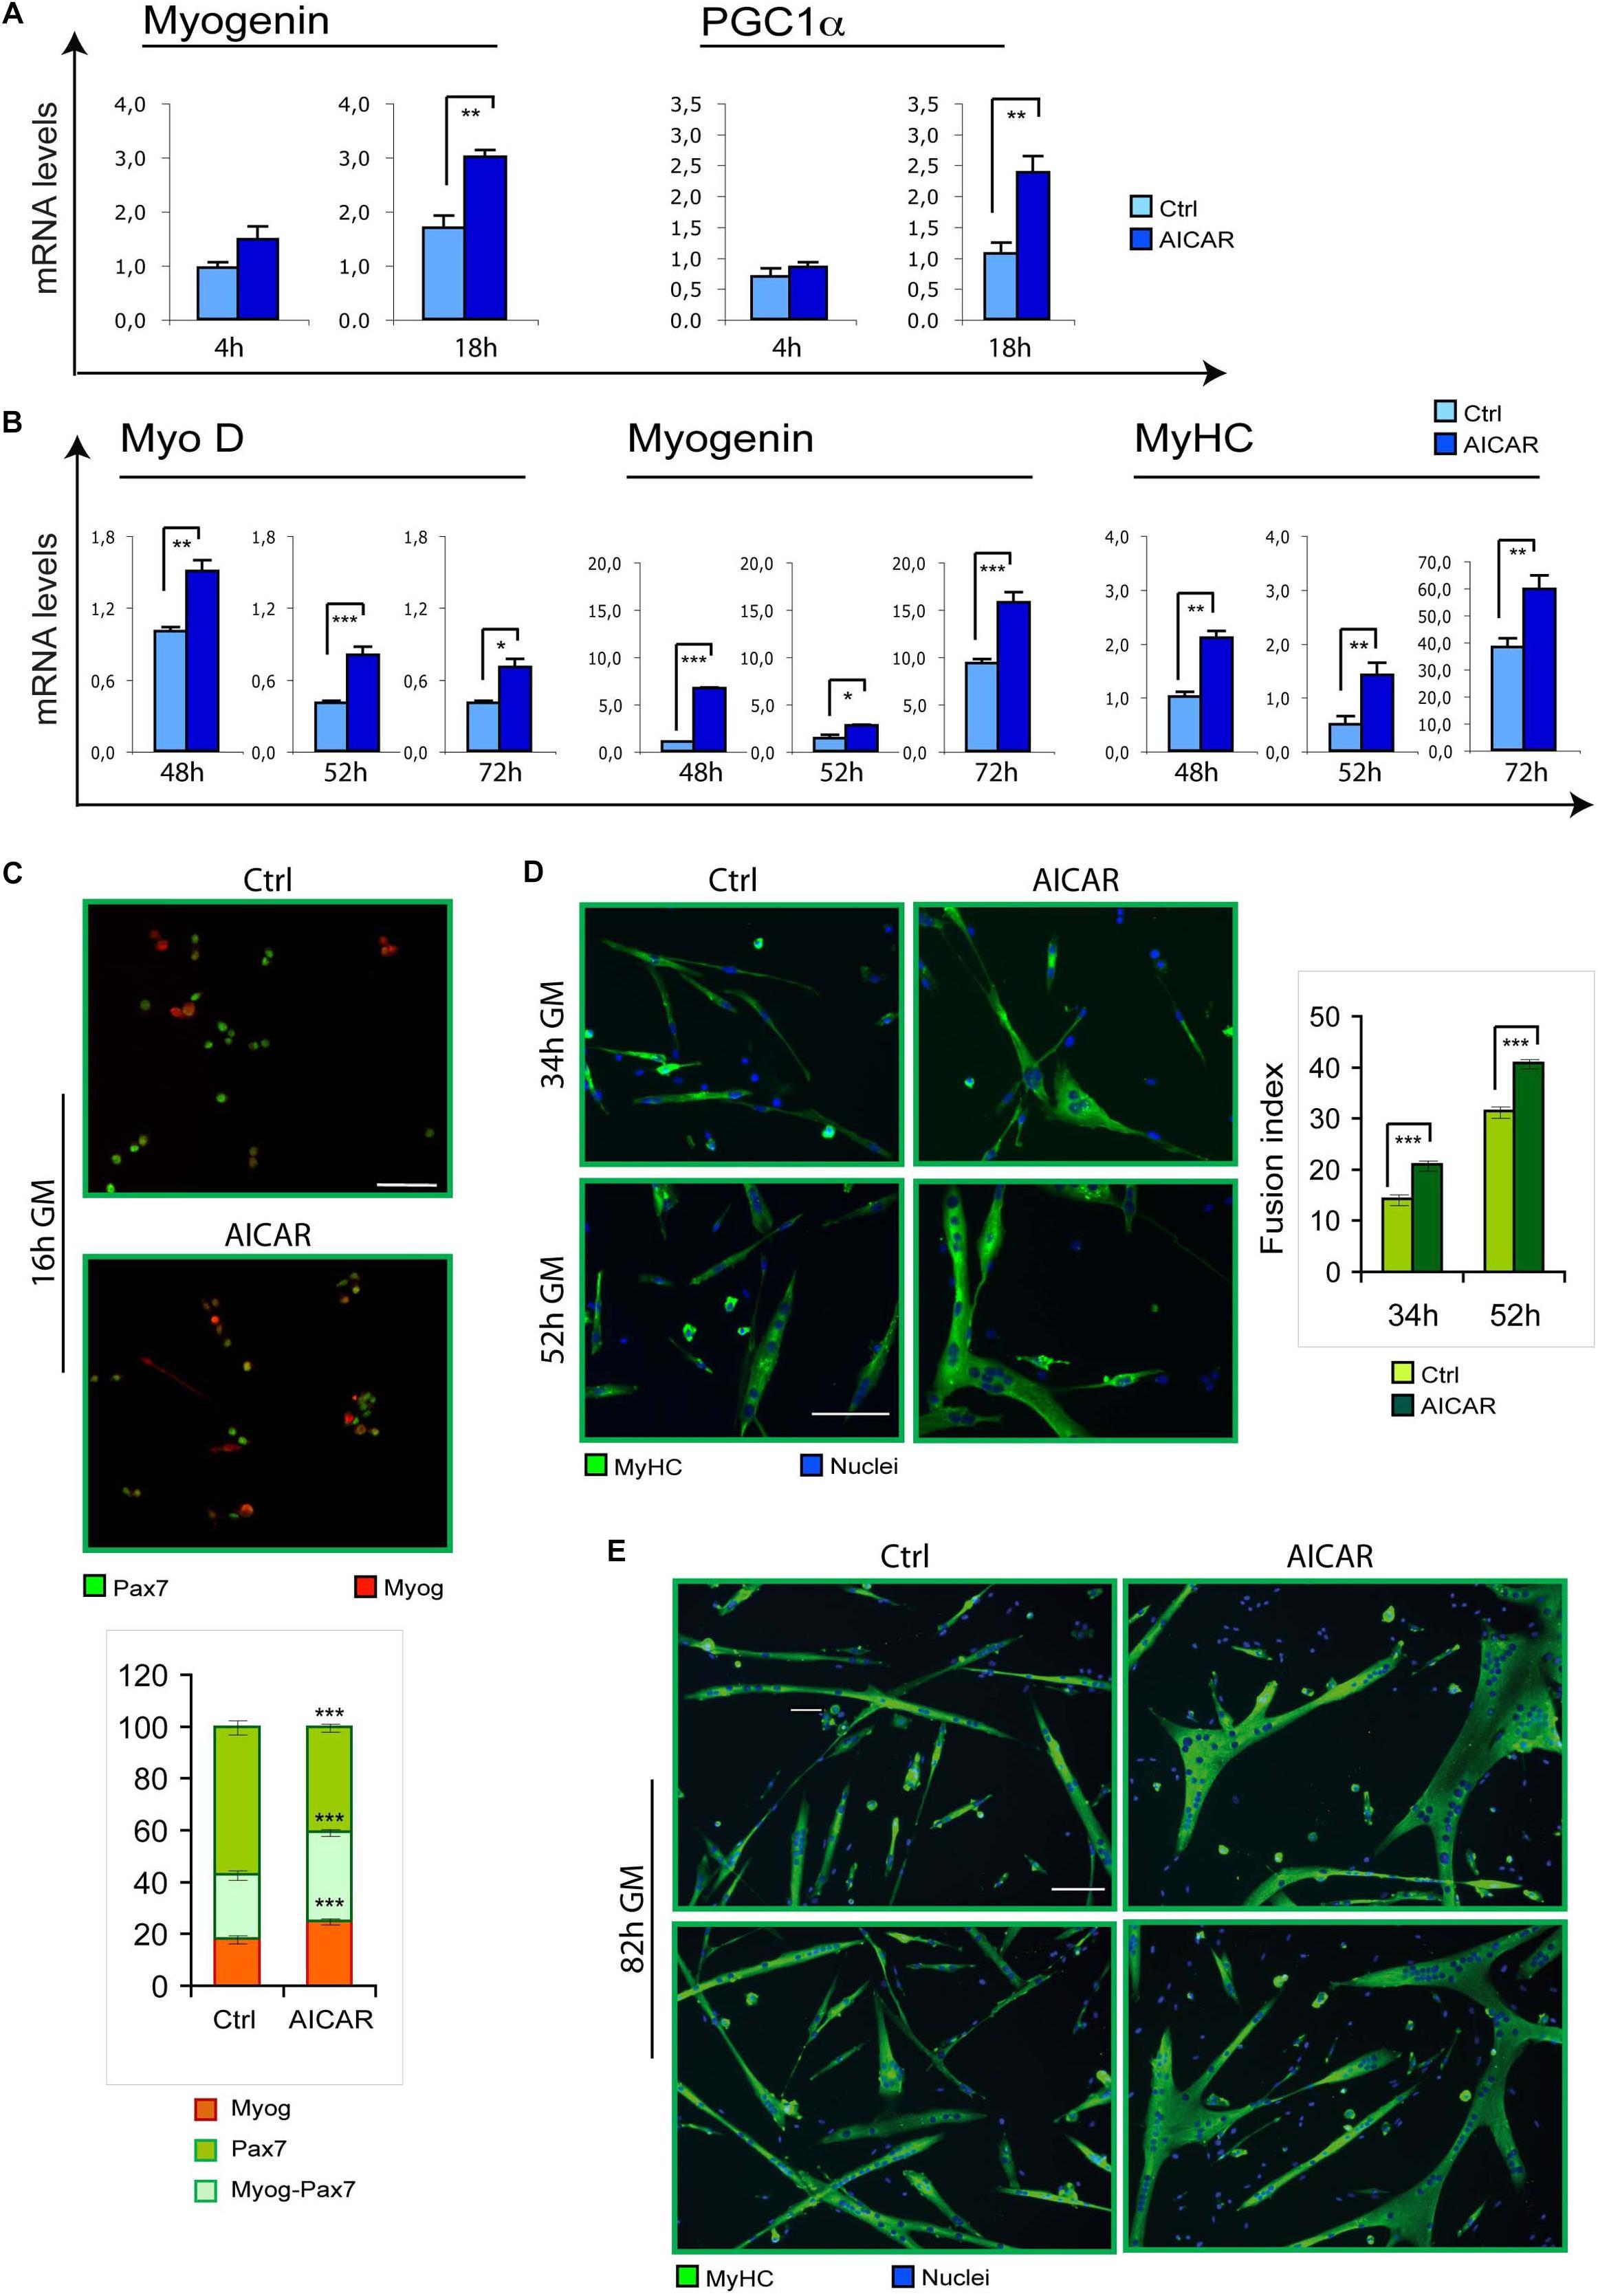 Frontiers | Metabolic Reprogramming Promotes Myogenesis During Aging